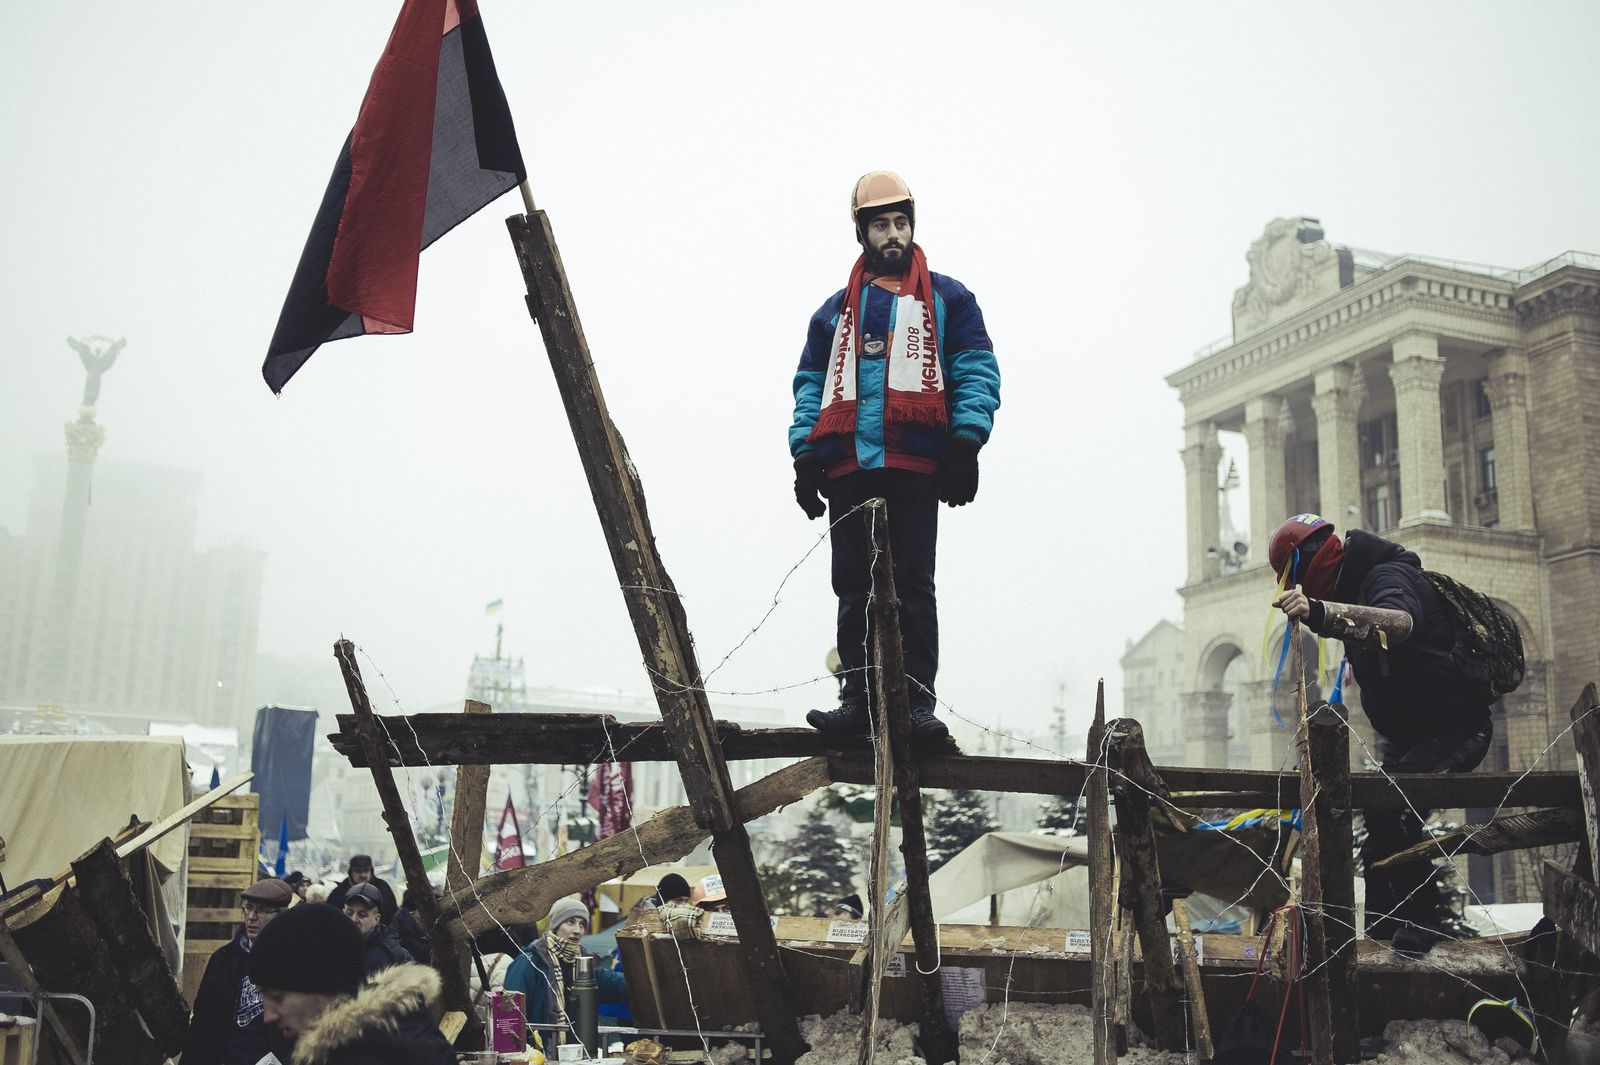 Sergei Nigoyan/ Ukraine/ Toter Demonstrant